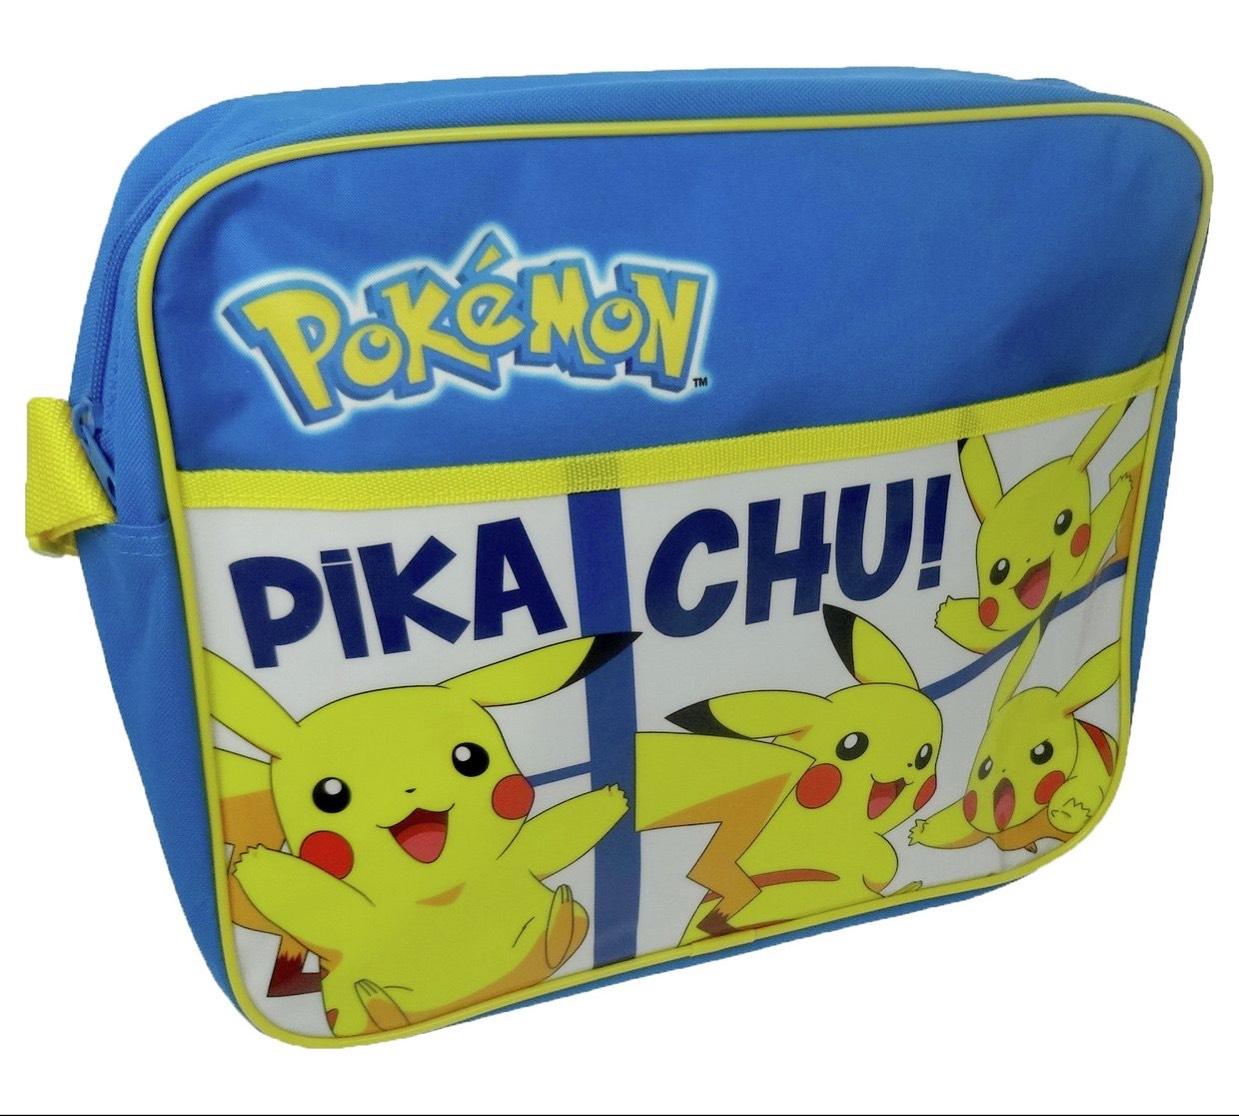 Pokemon Pikachu Messenger Bag Was £12.99 Now £5.99 Online @ Argos